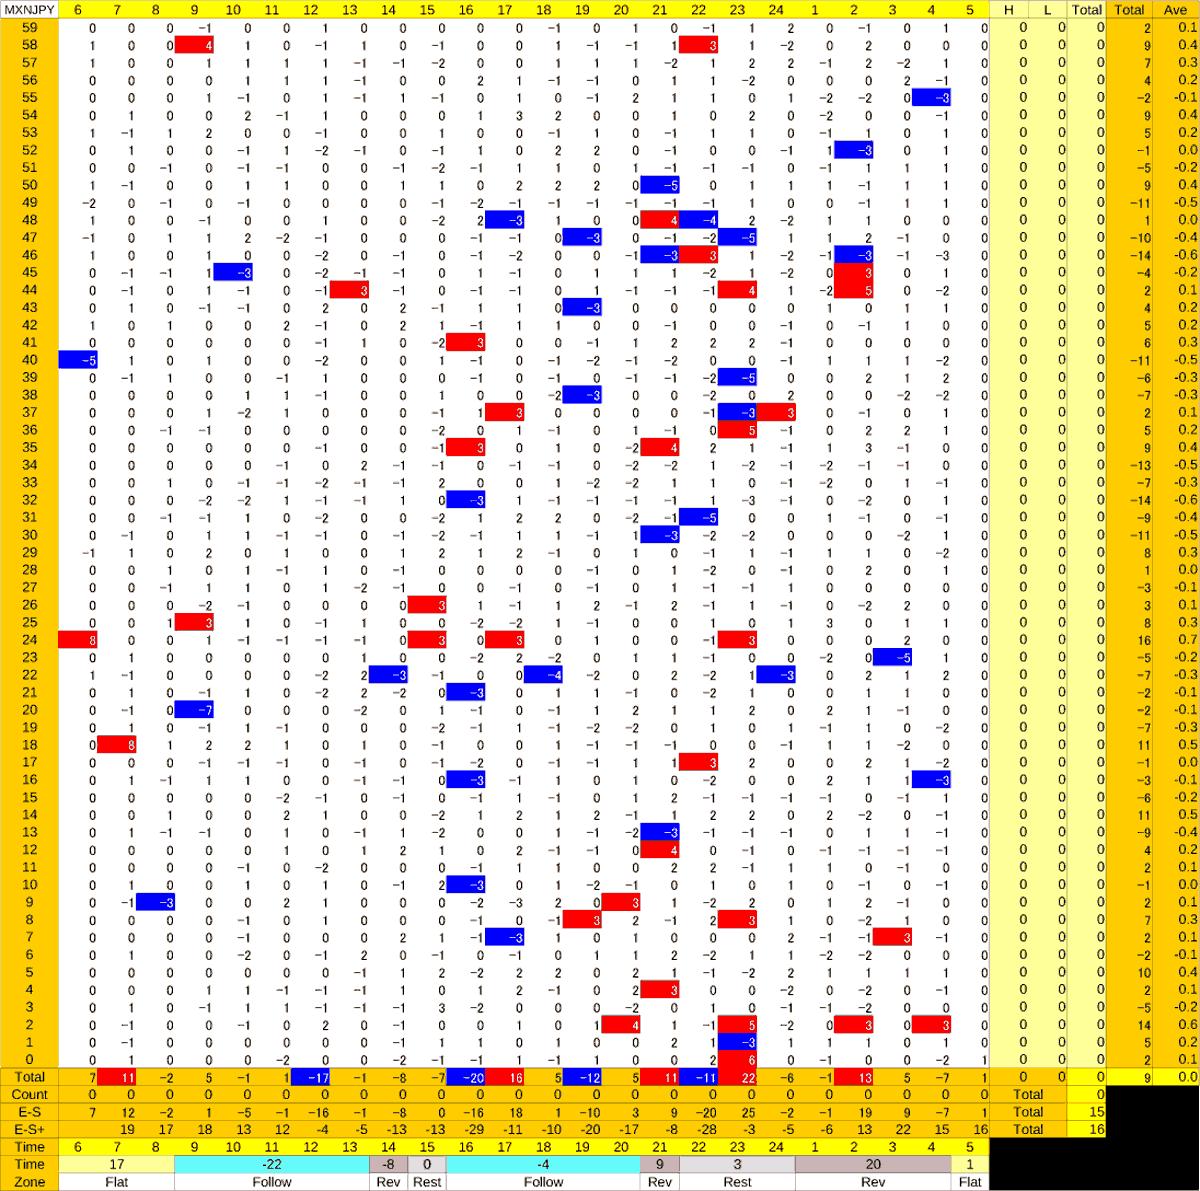 20200724_HS(3)MXNJPY